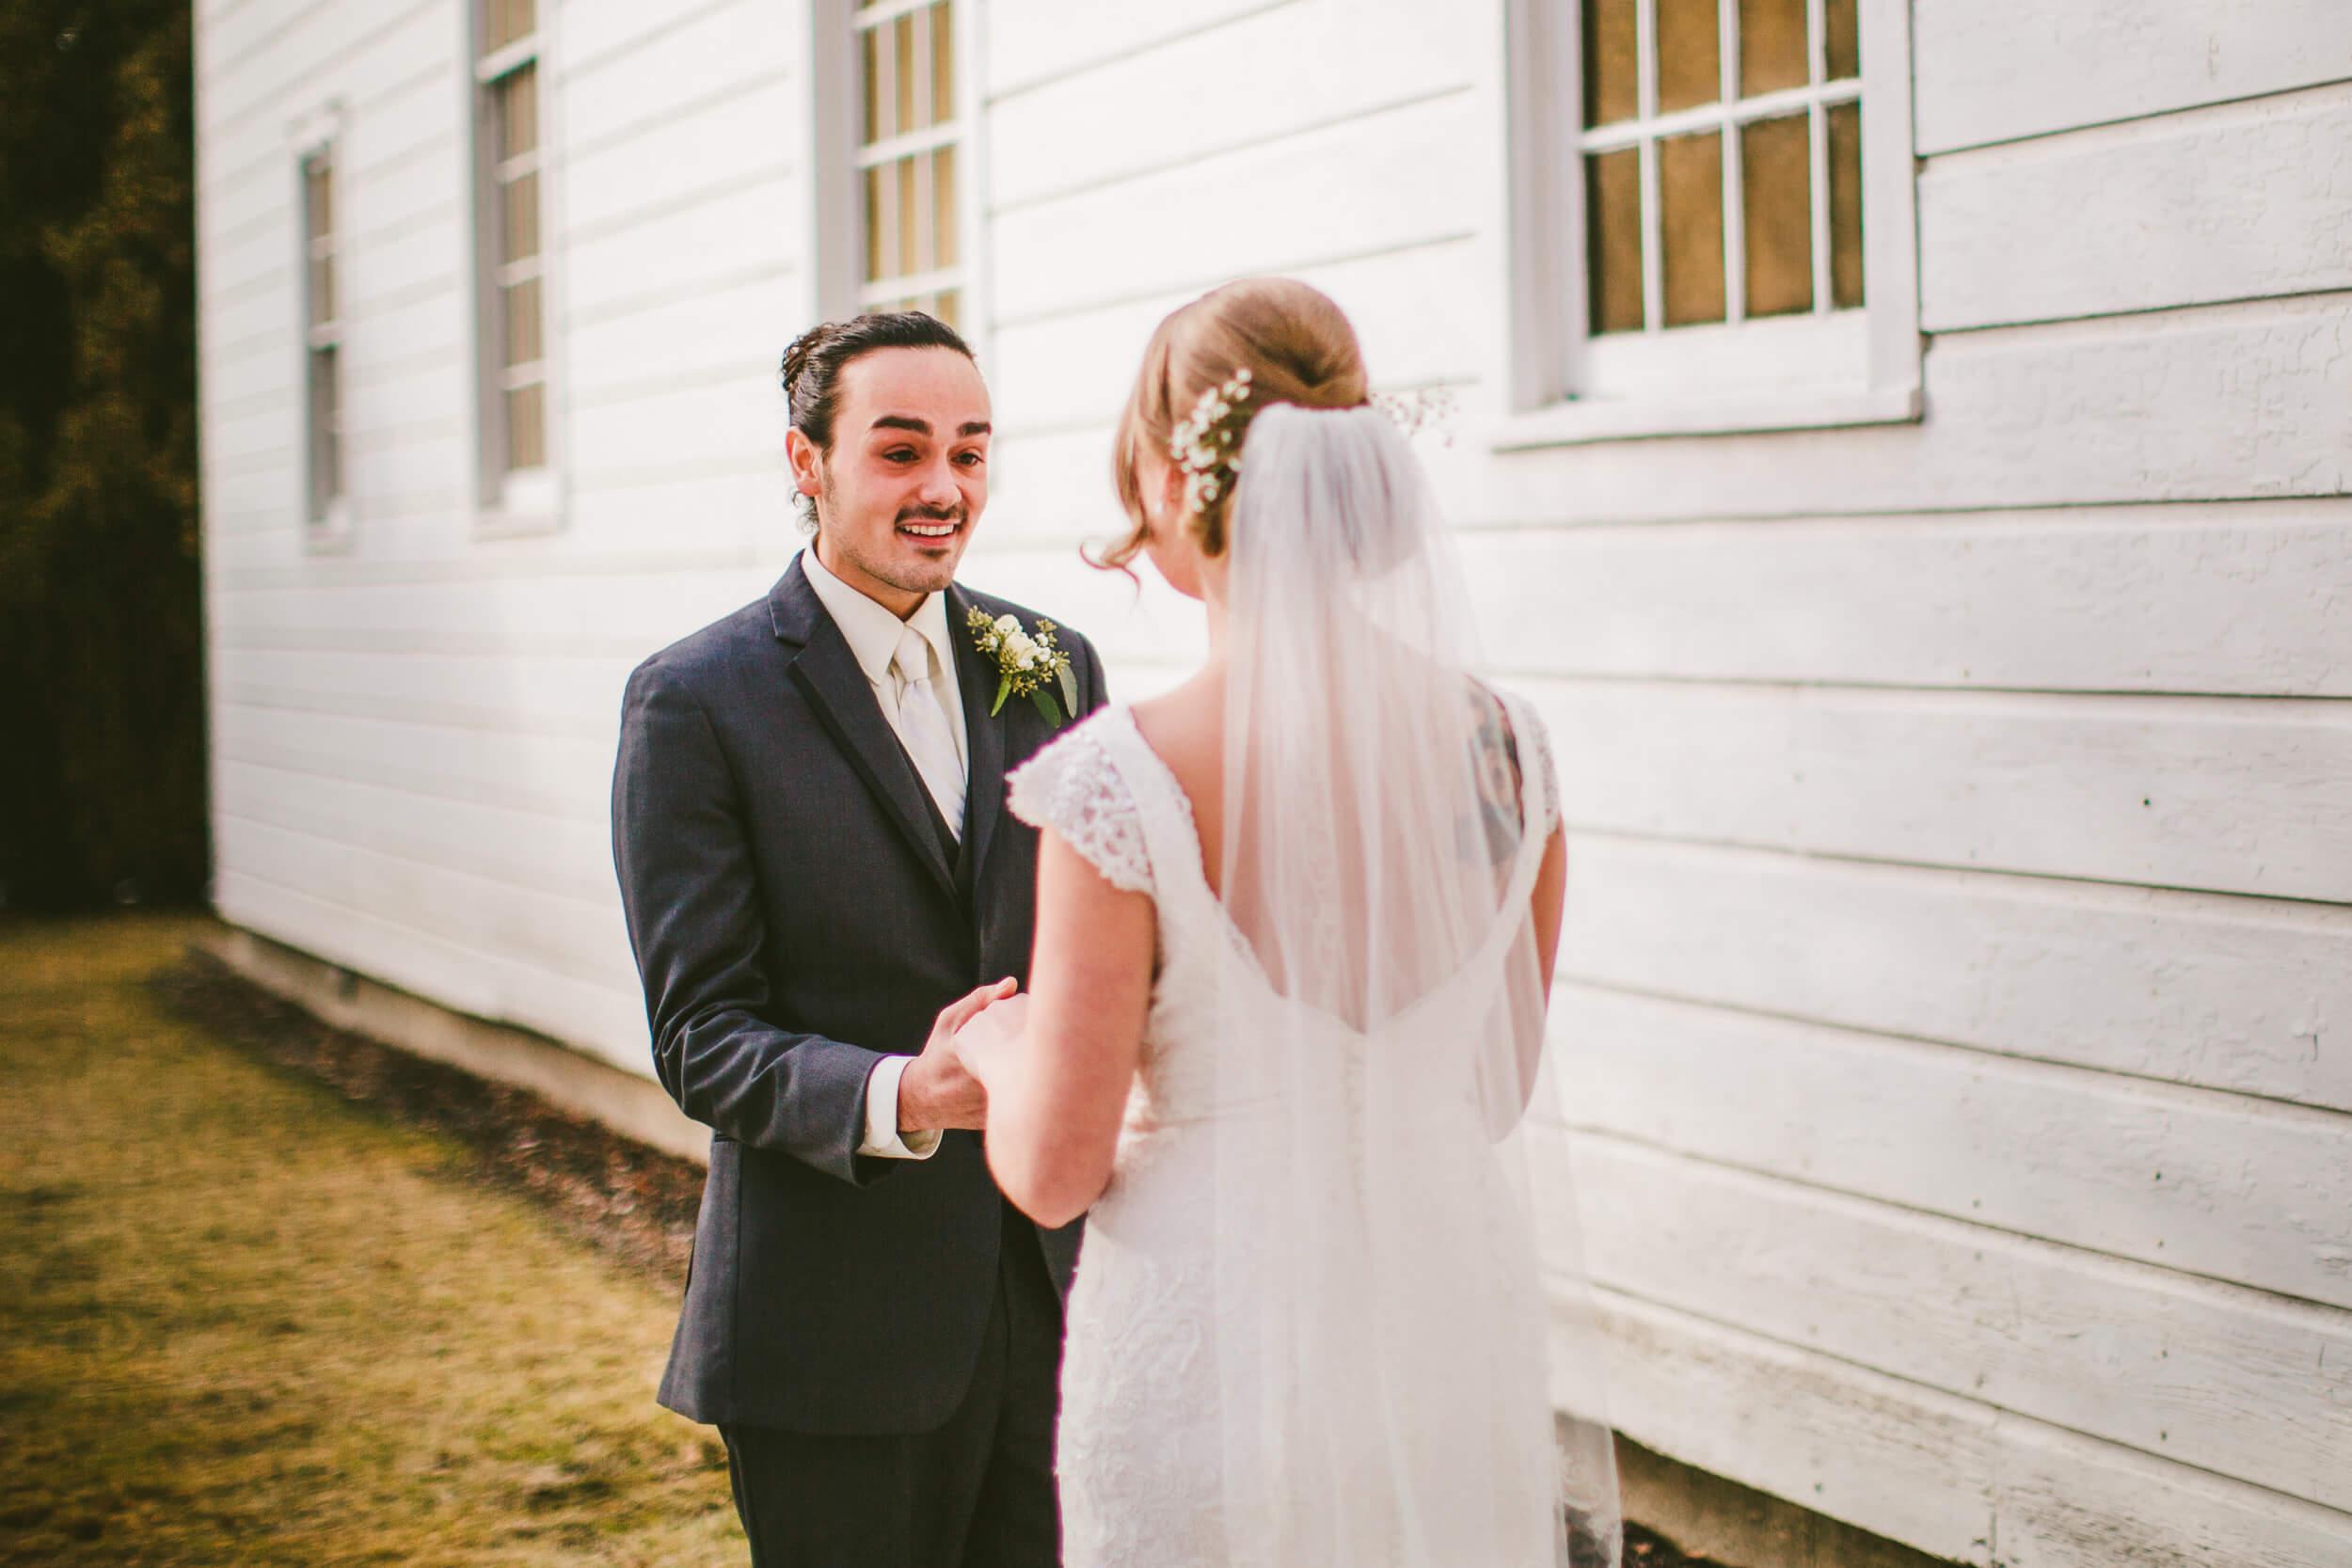 mukogawa winter wedding in spokane (74).jpg